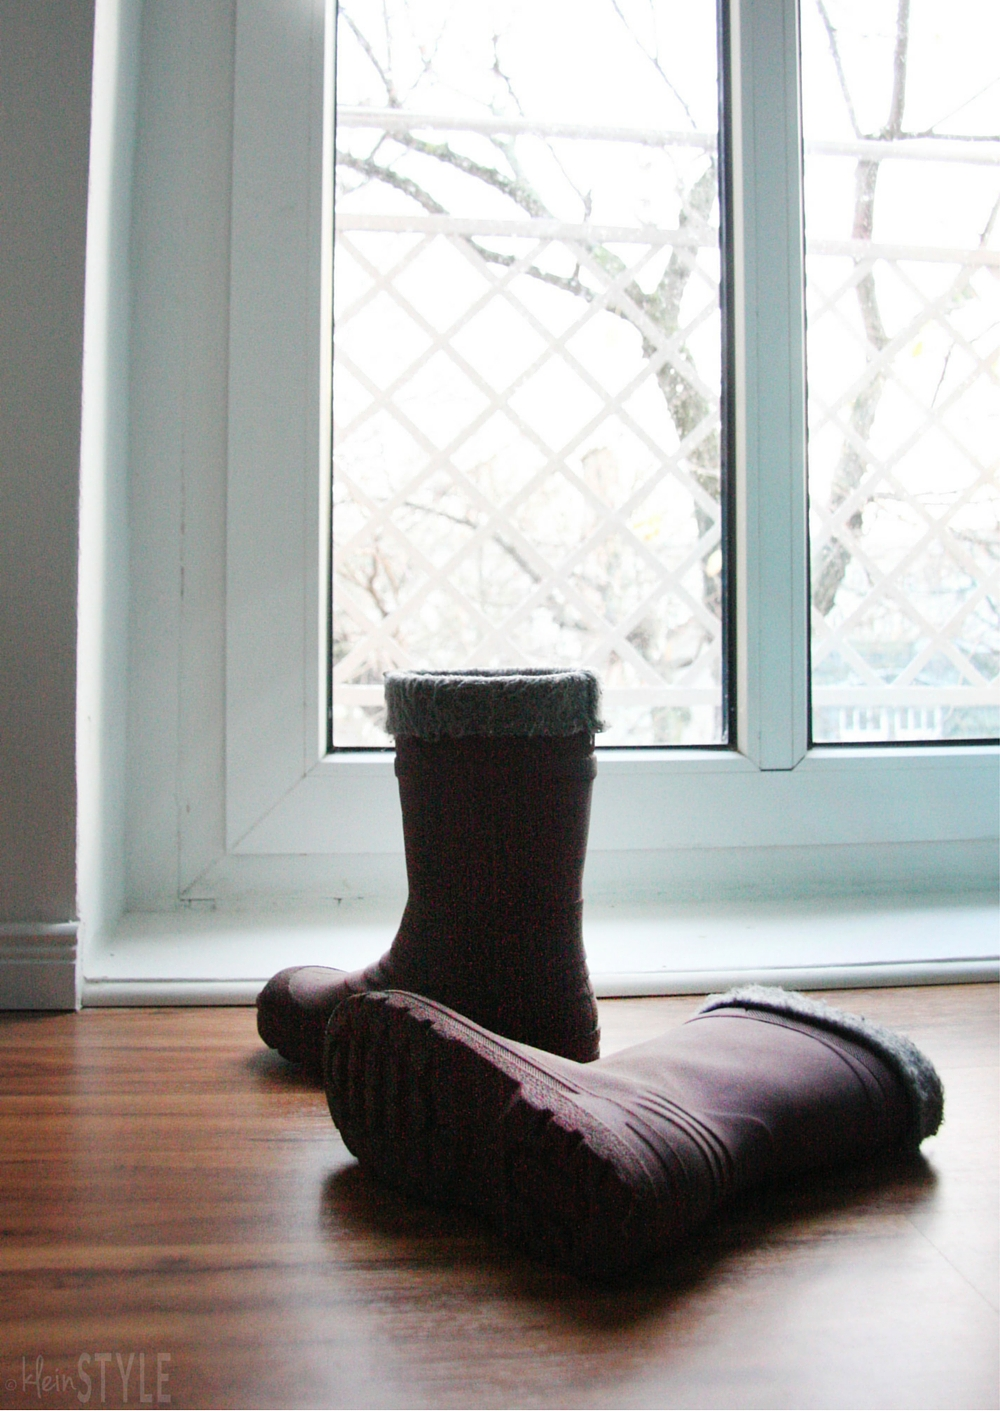 Regen, Schnee, Matsch : Kinderstiefel